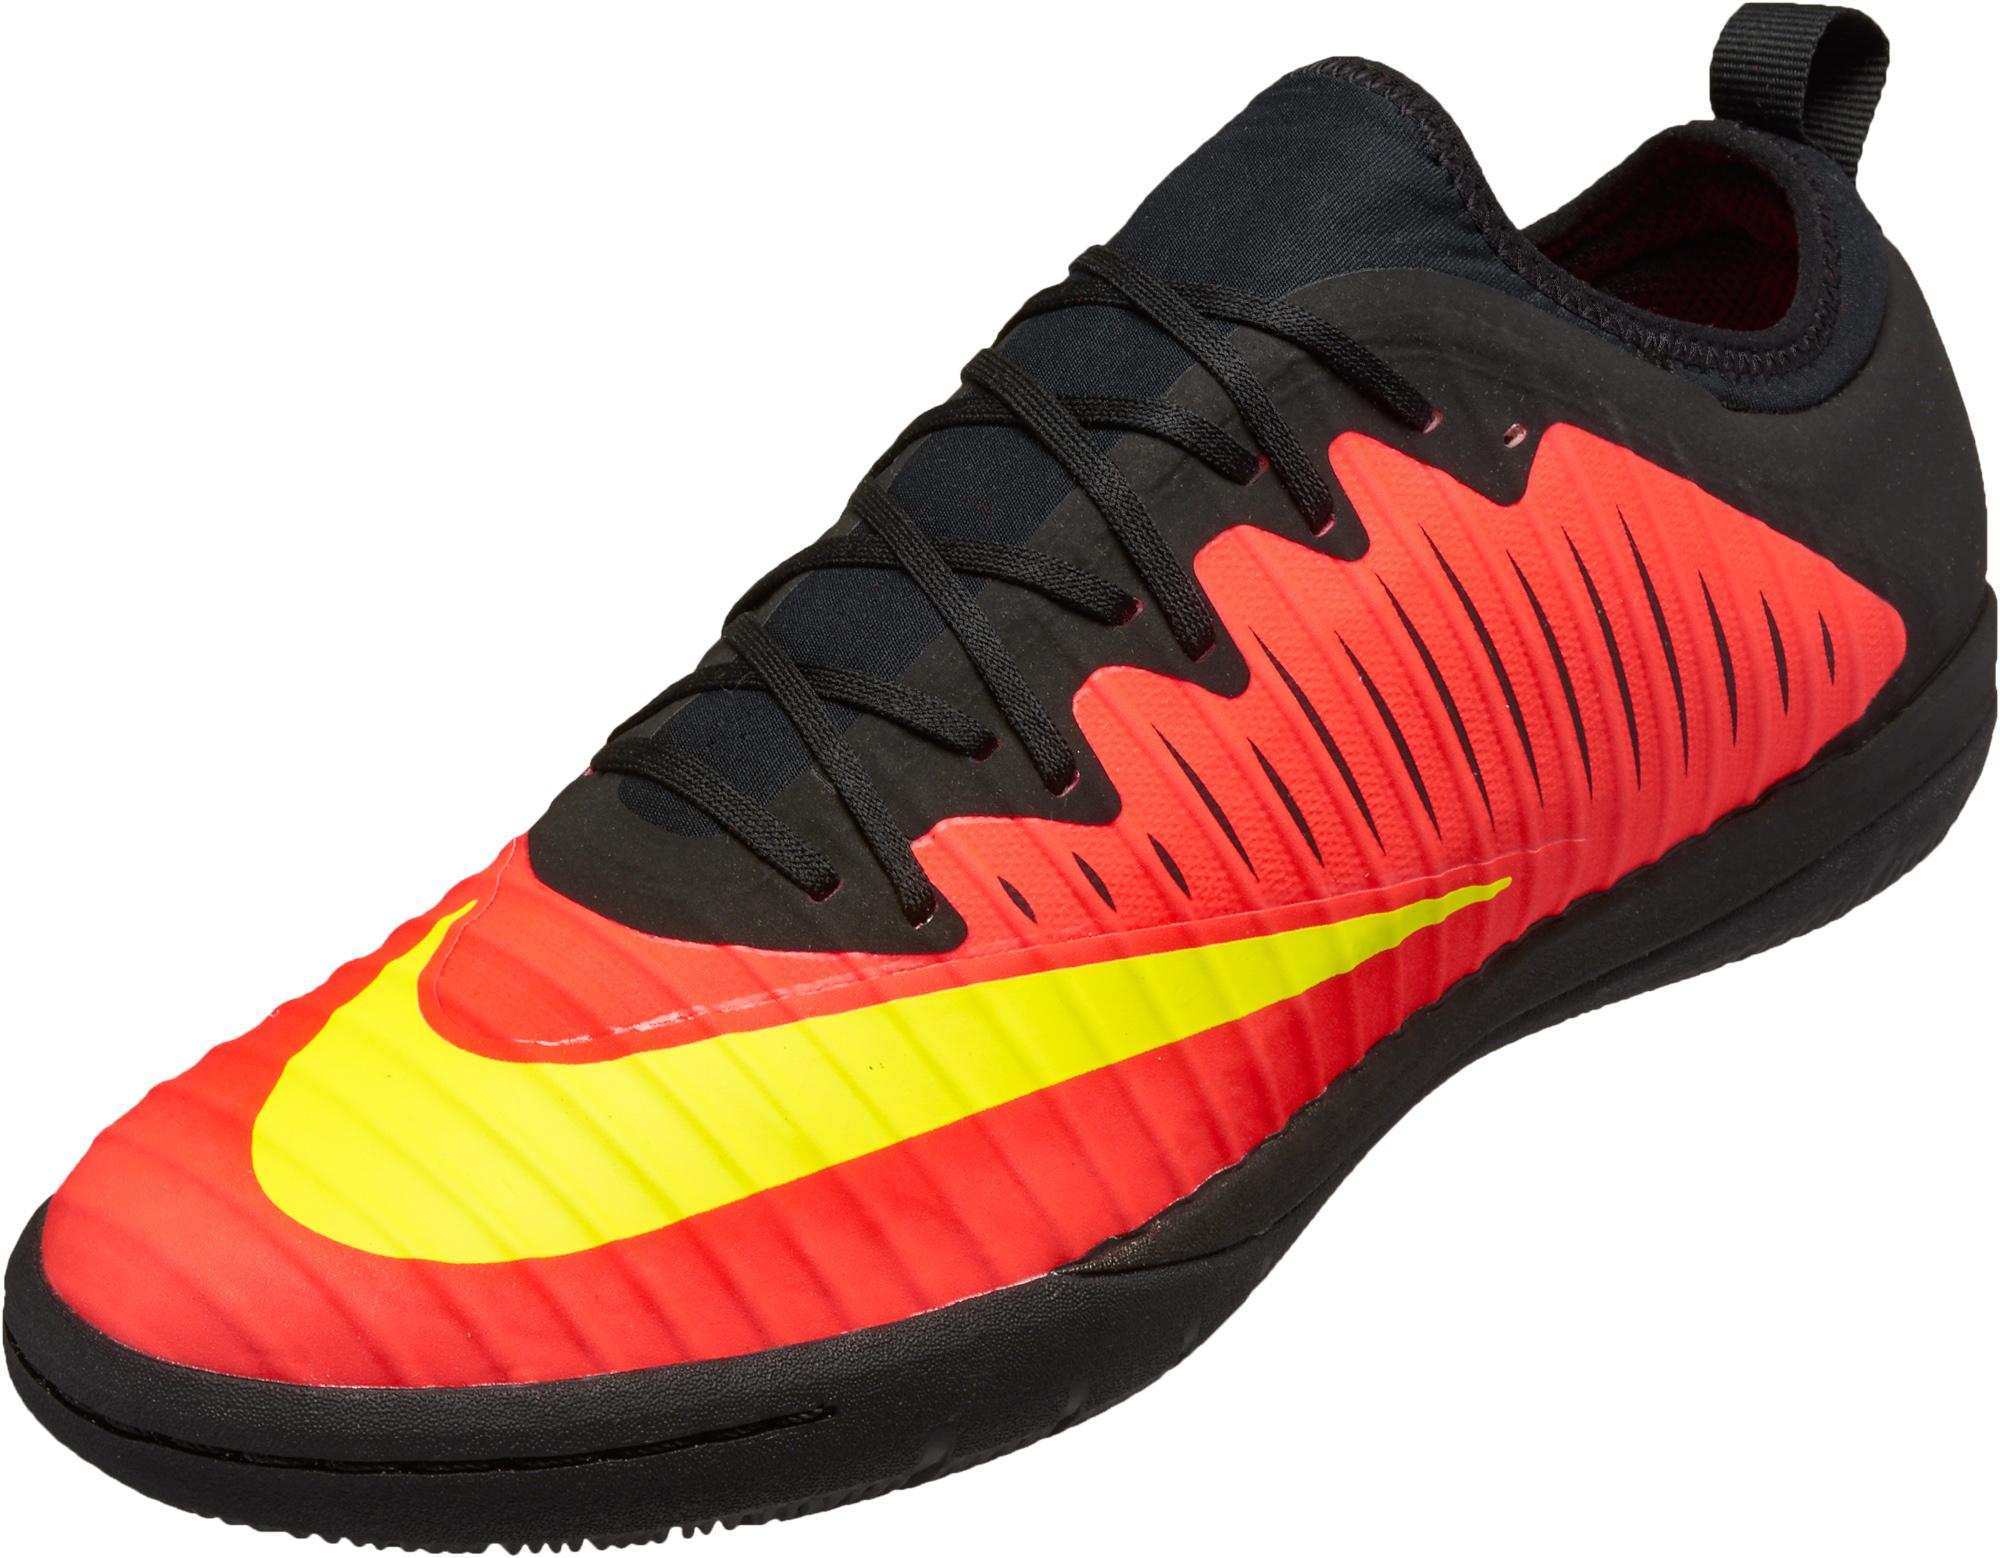 Nike MercurialX Finale II IC Soccer Shoes - Nike MercurialX Finales 33025519e9